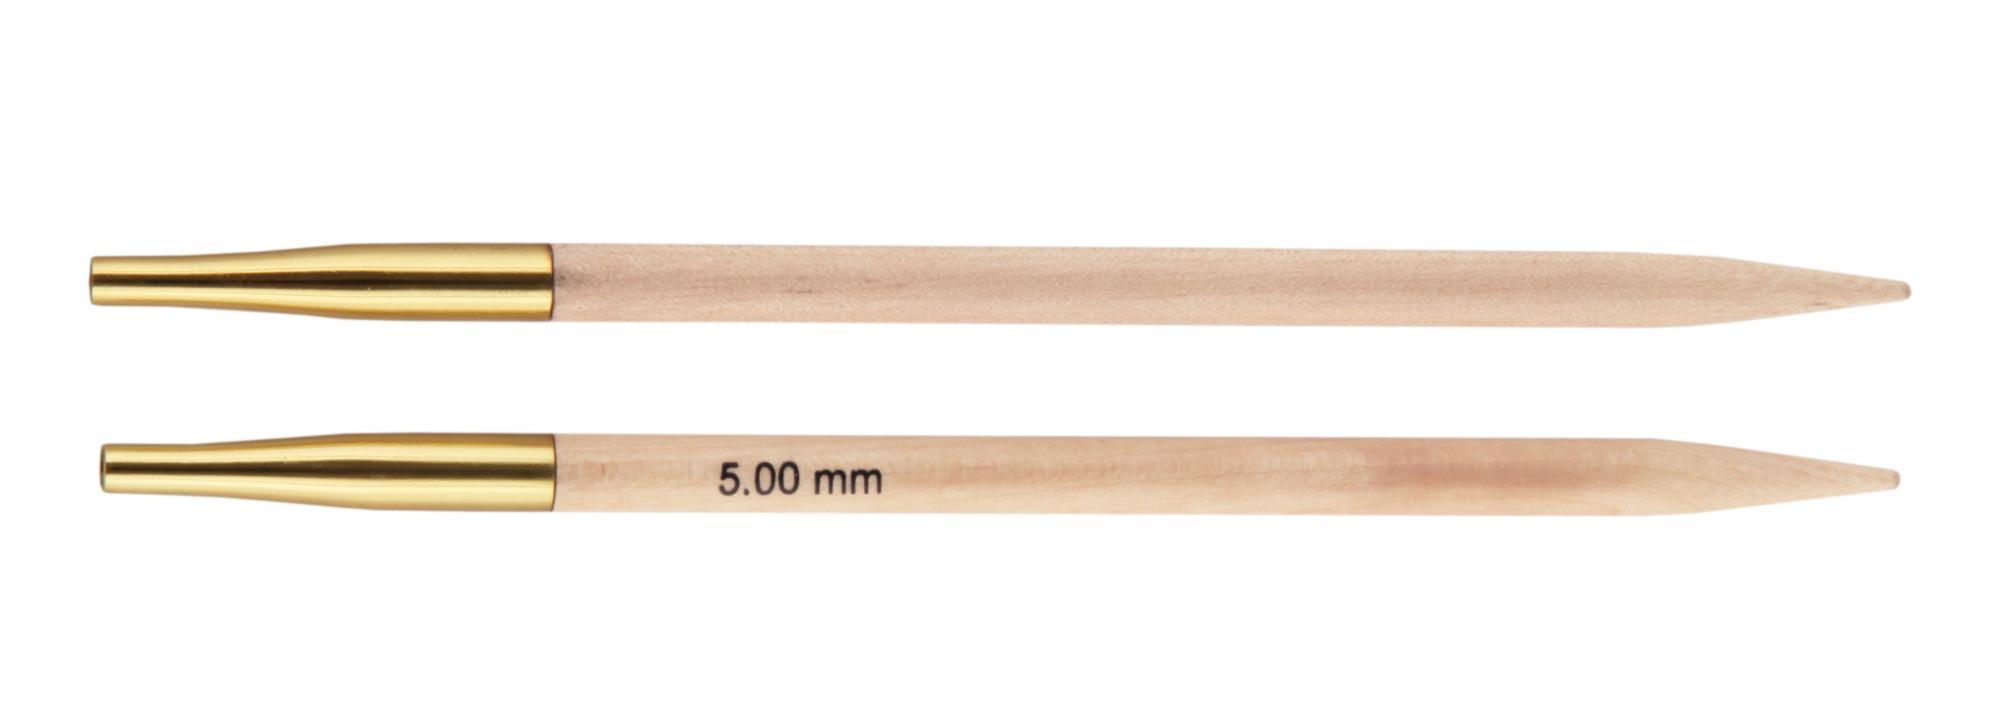 Спицы съемные Basix Birch Wood KnitPro, 35637, 5.00 мм